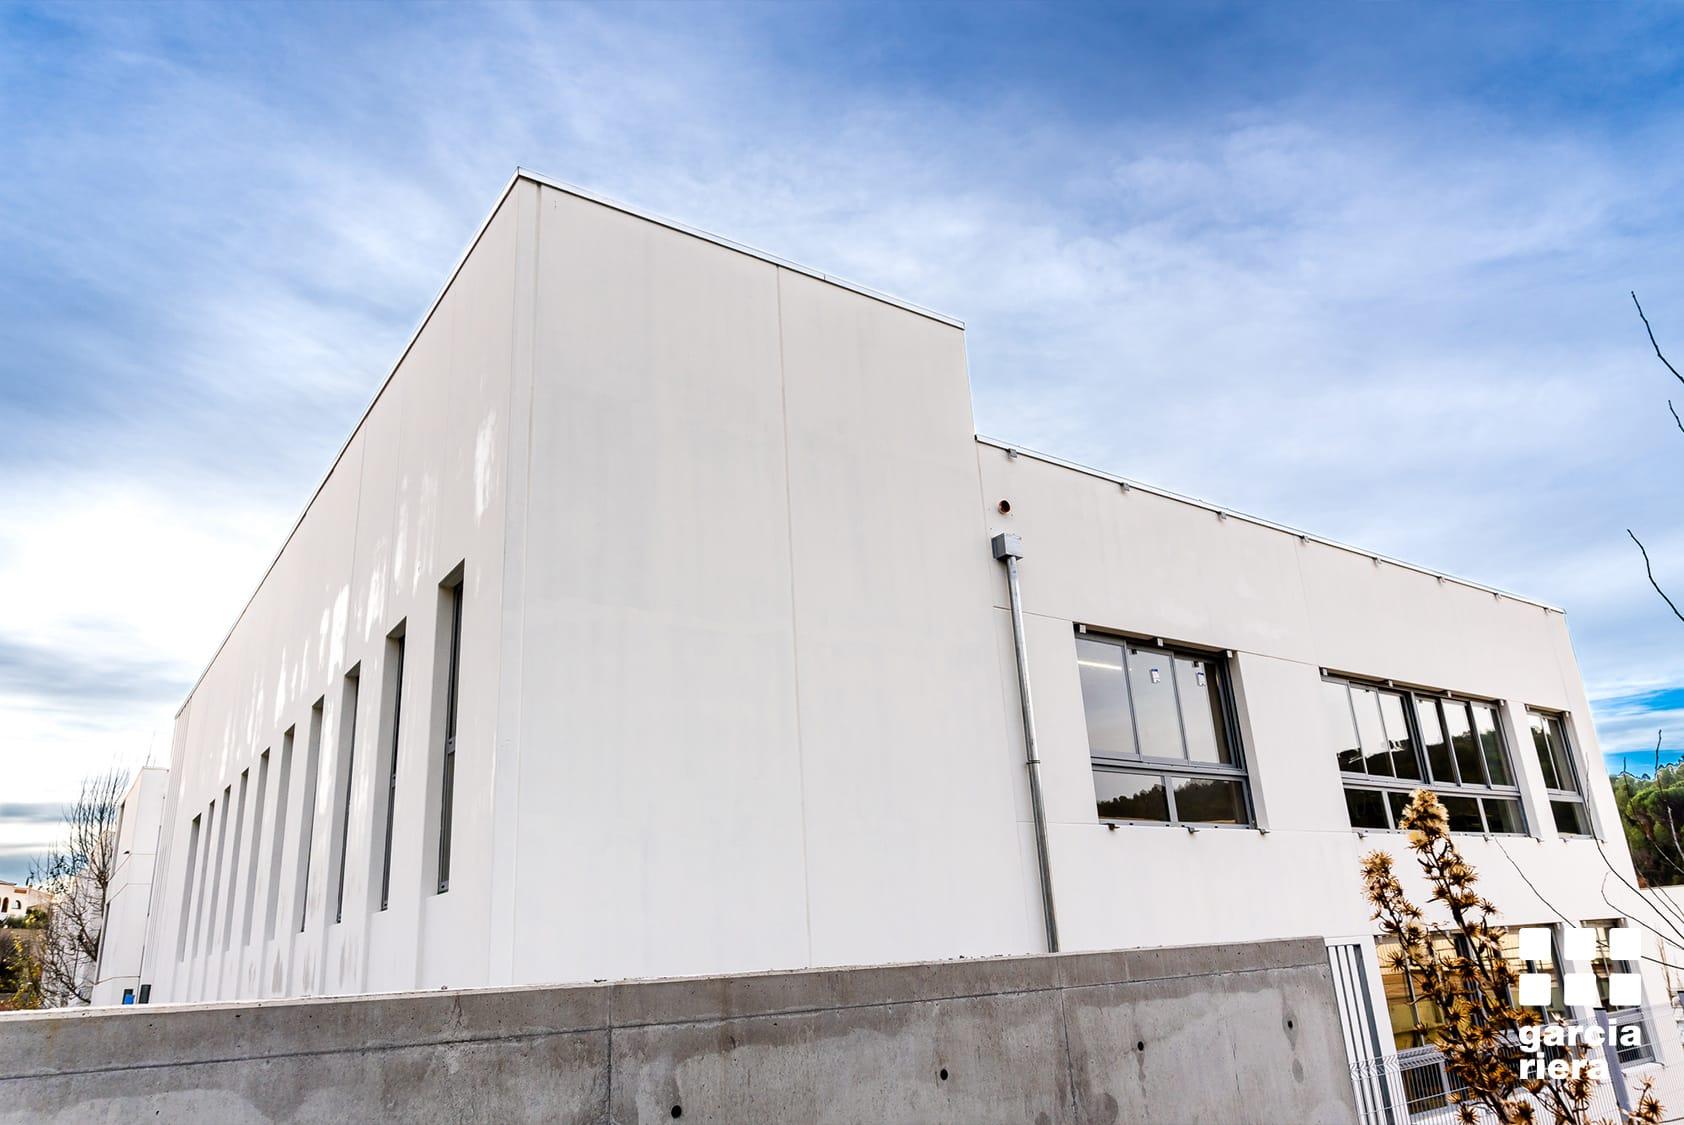 Garcia Riera projecte ampliacio escola sant quinti mediona